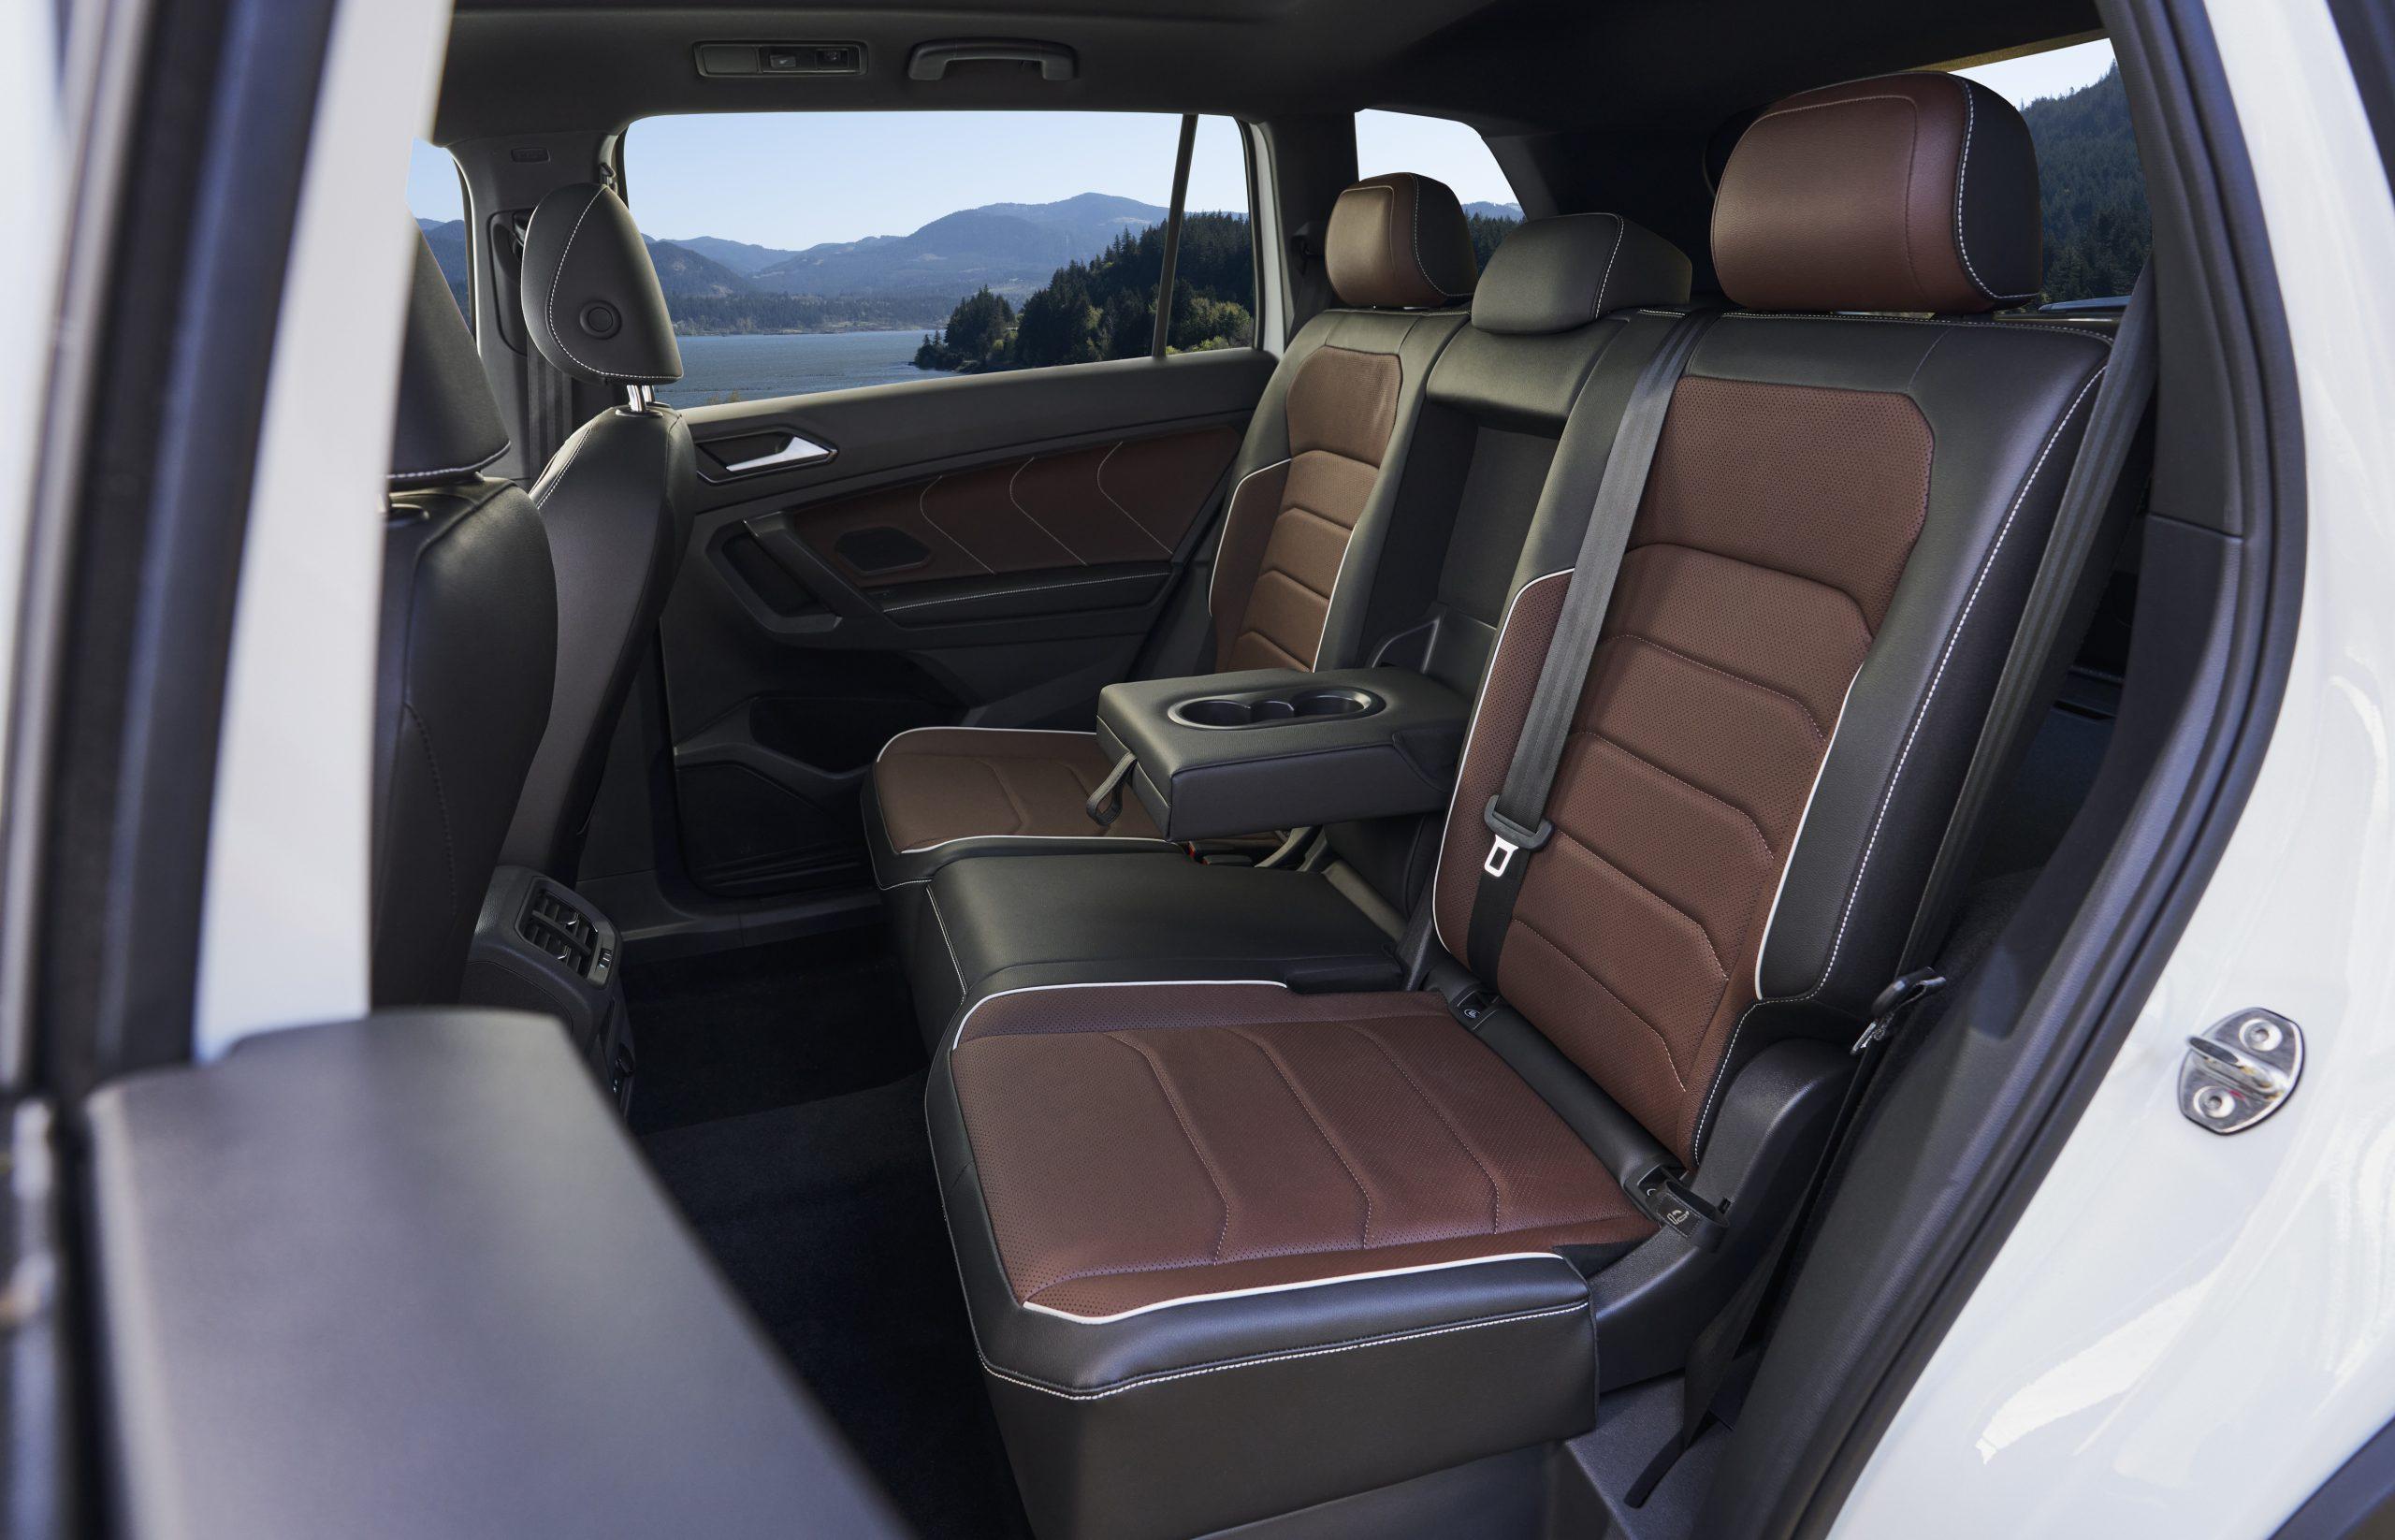 2022 VW Tiguan facelift interior rear seat leather